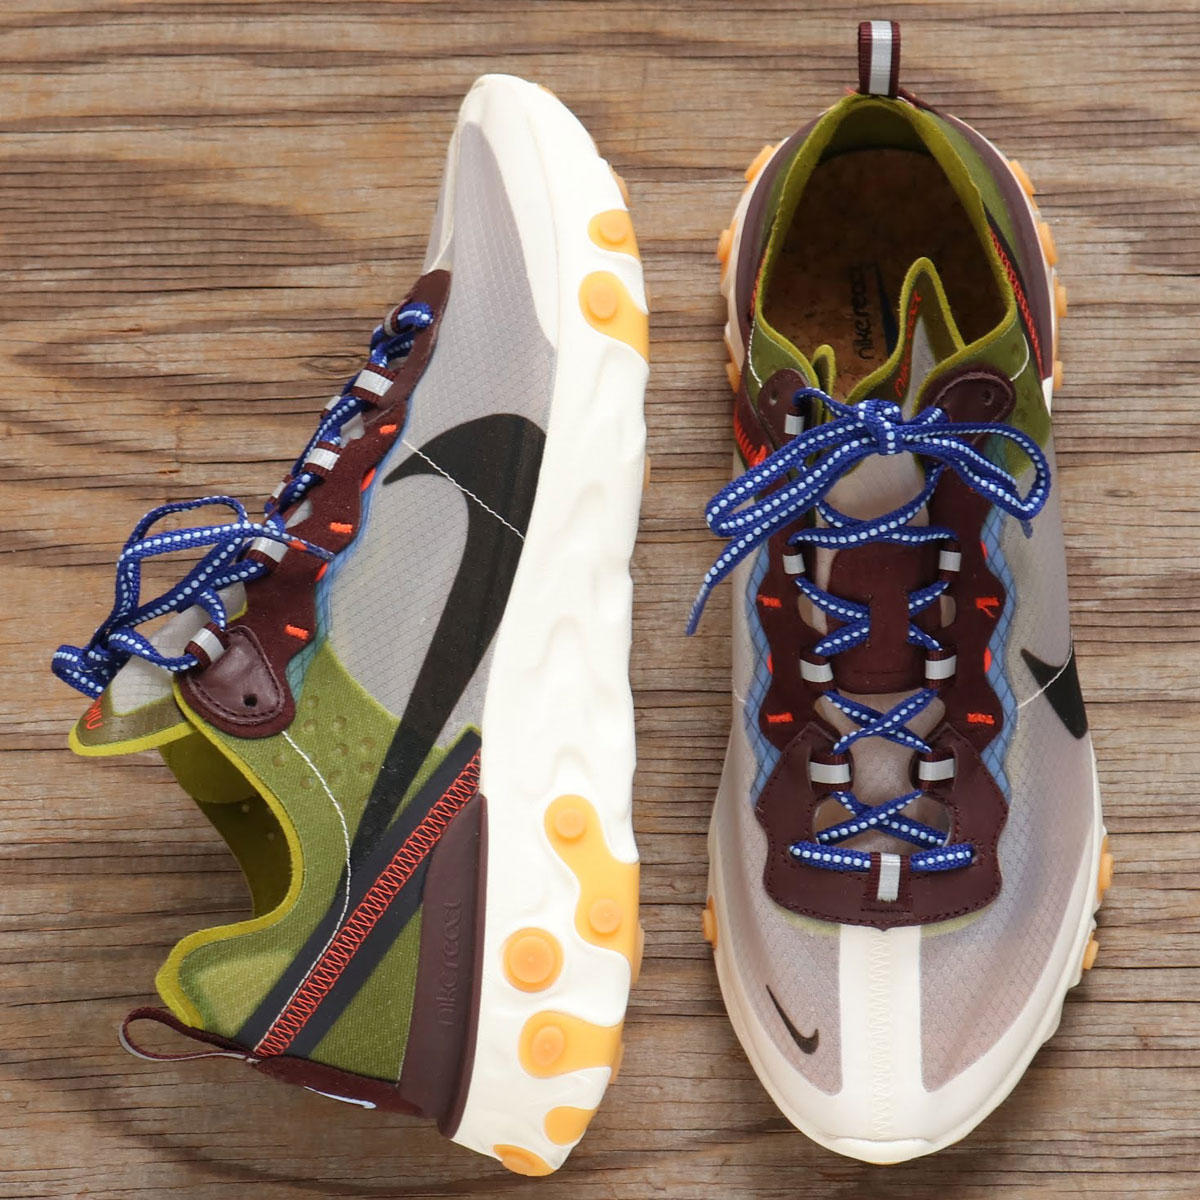 extremidades simpático triángulo  Nike React Element 87 Moss Mens El Dorado Running Shoe AQ1090-300